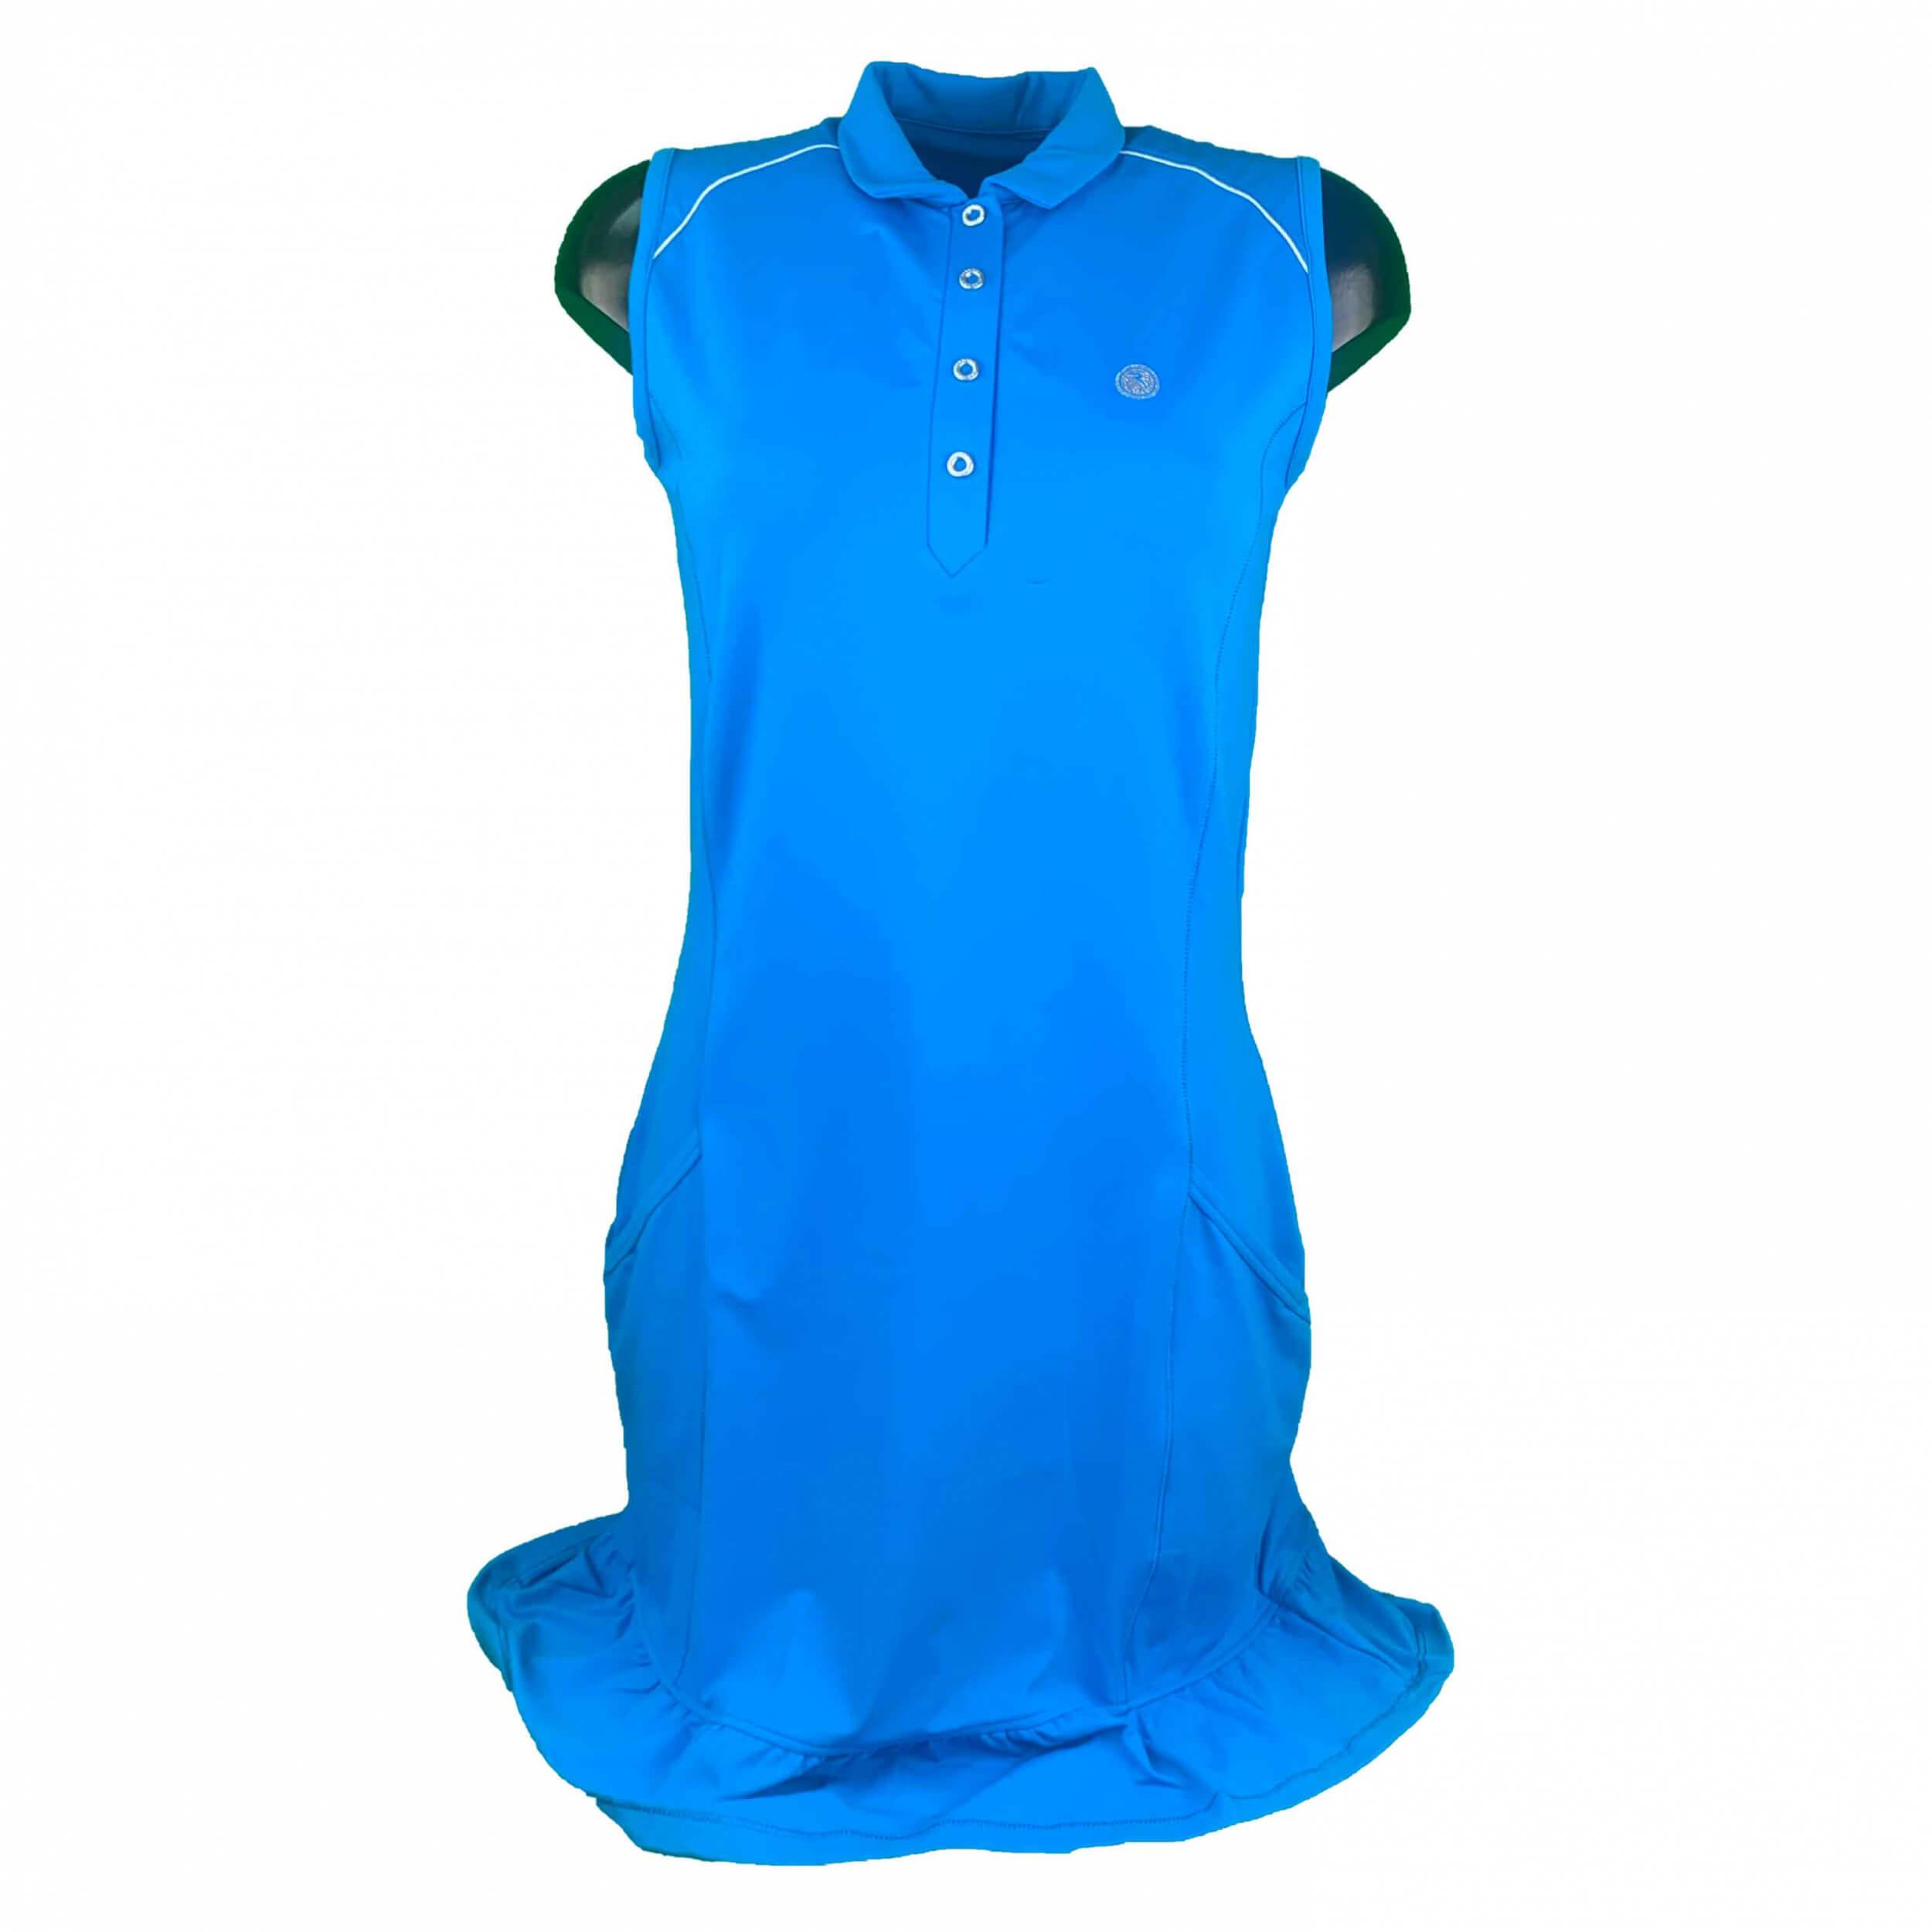 Chervo Damen Kleid Japur Sun Block royal blau ohne Hose 2.Wahl